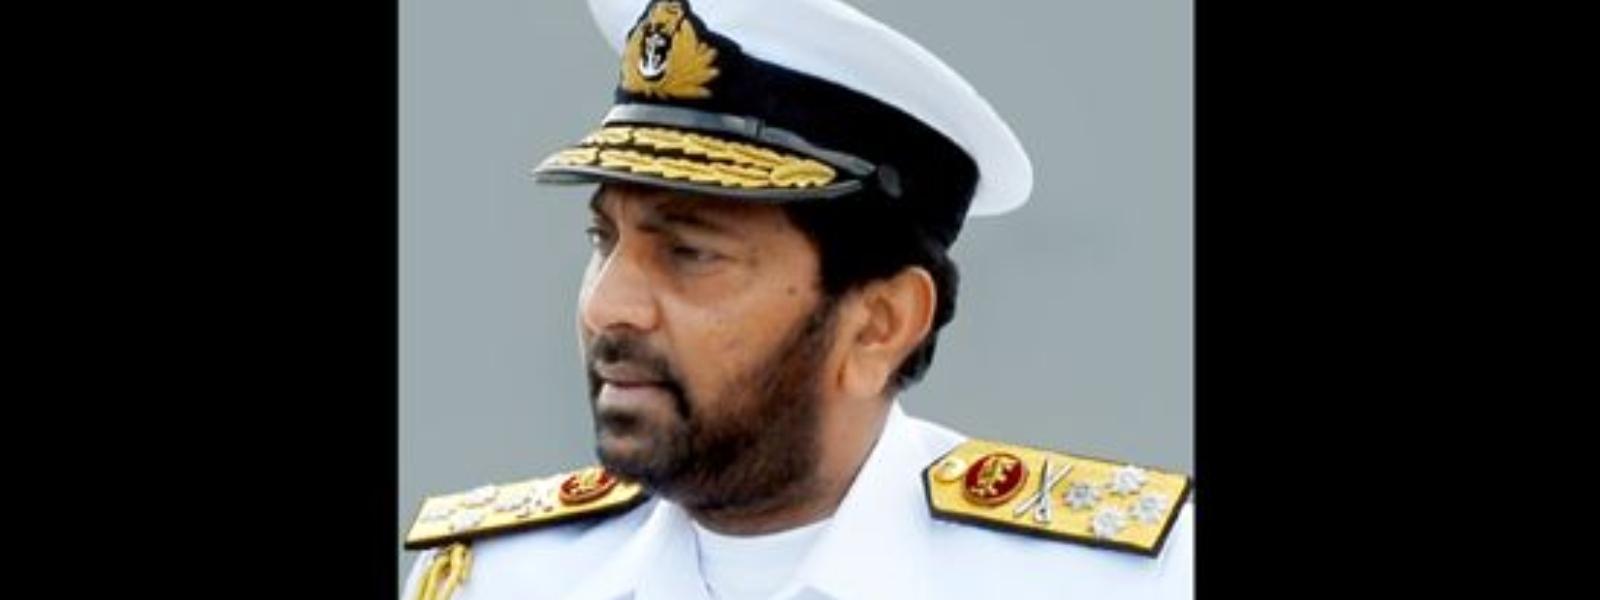 Admiral Wasantha Karannagoda to become first Sri Lankan Admiral of the Fleet